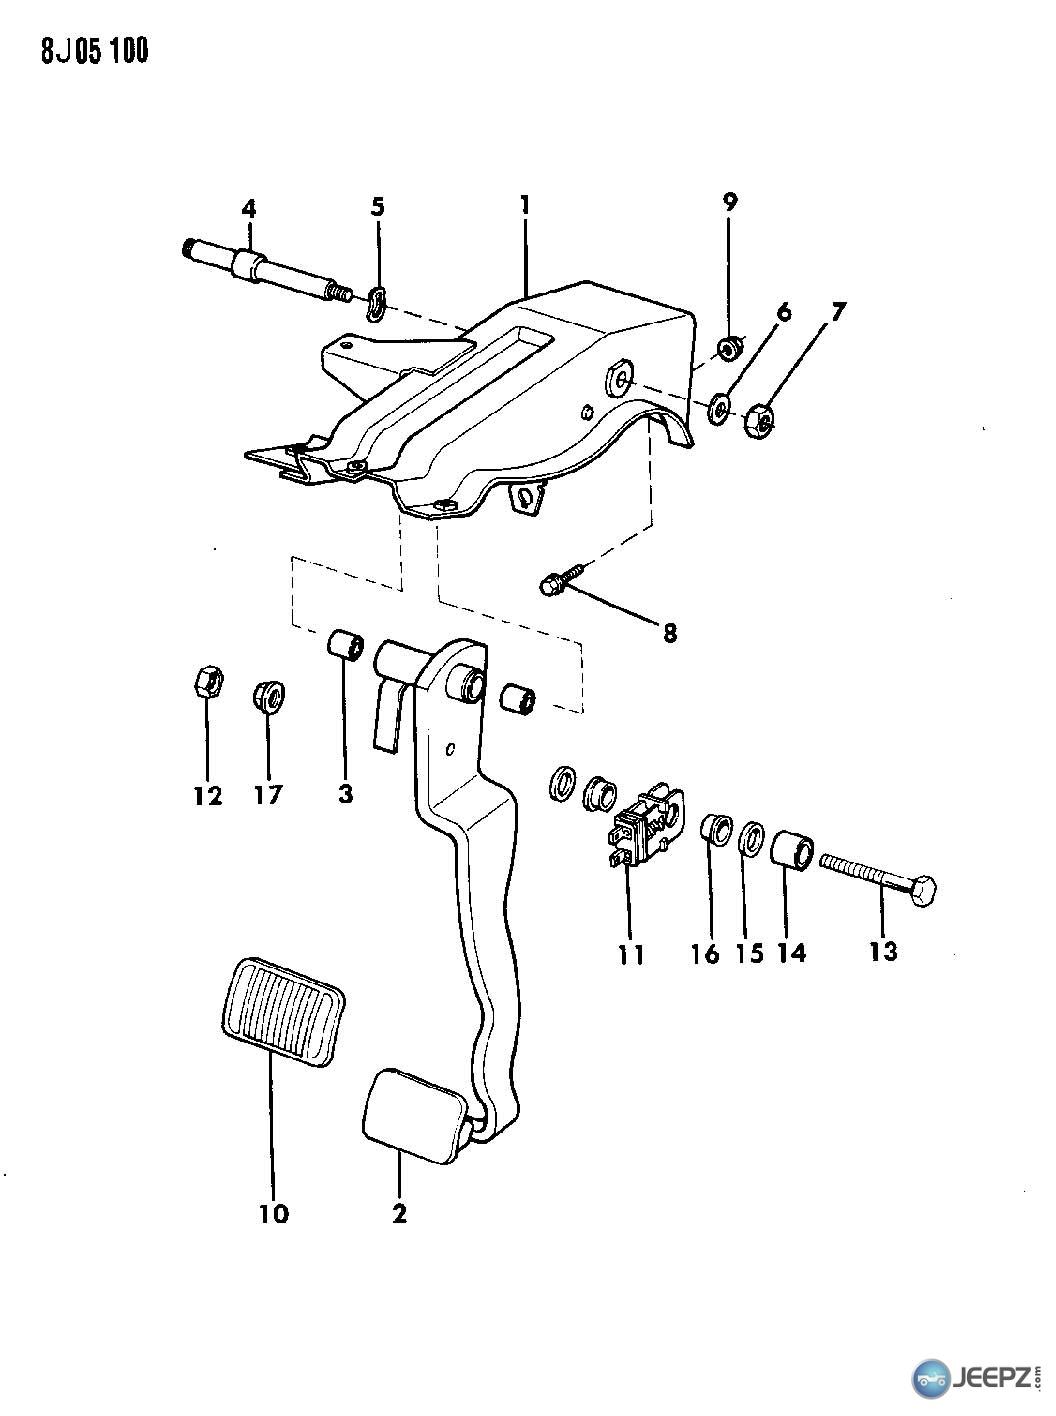 44452 brake booster push rod pedal help cj7 wiring diagram at w freeautoresponder index2 13399d1363202313enginenotstartingtachometersketch